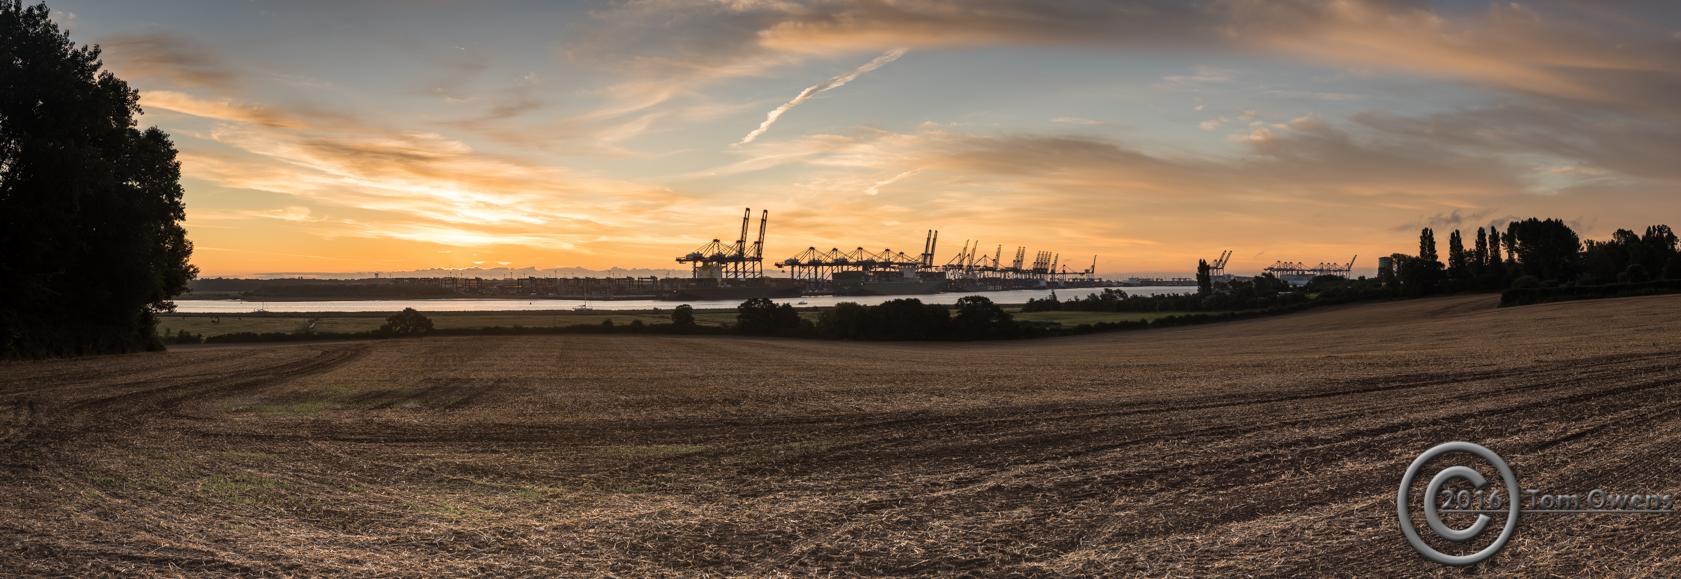 Felixstowe docks at dawn